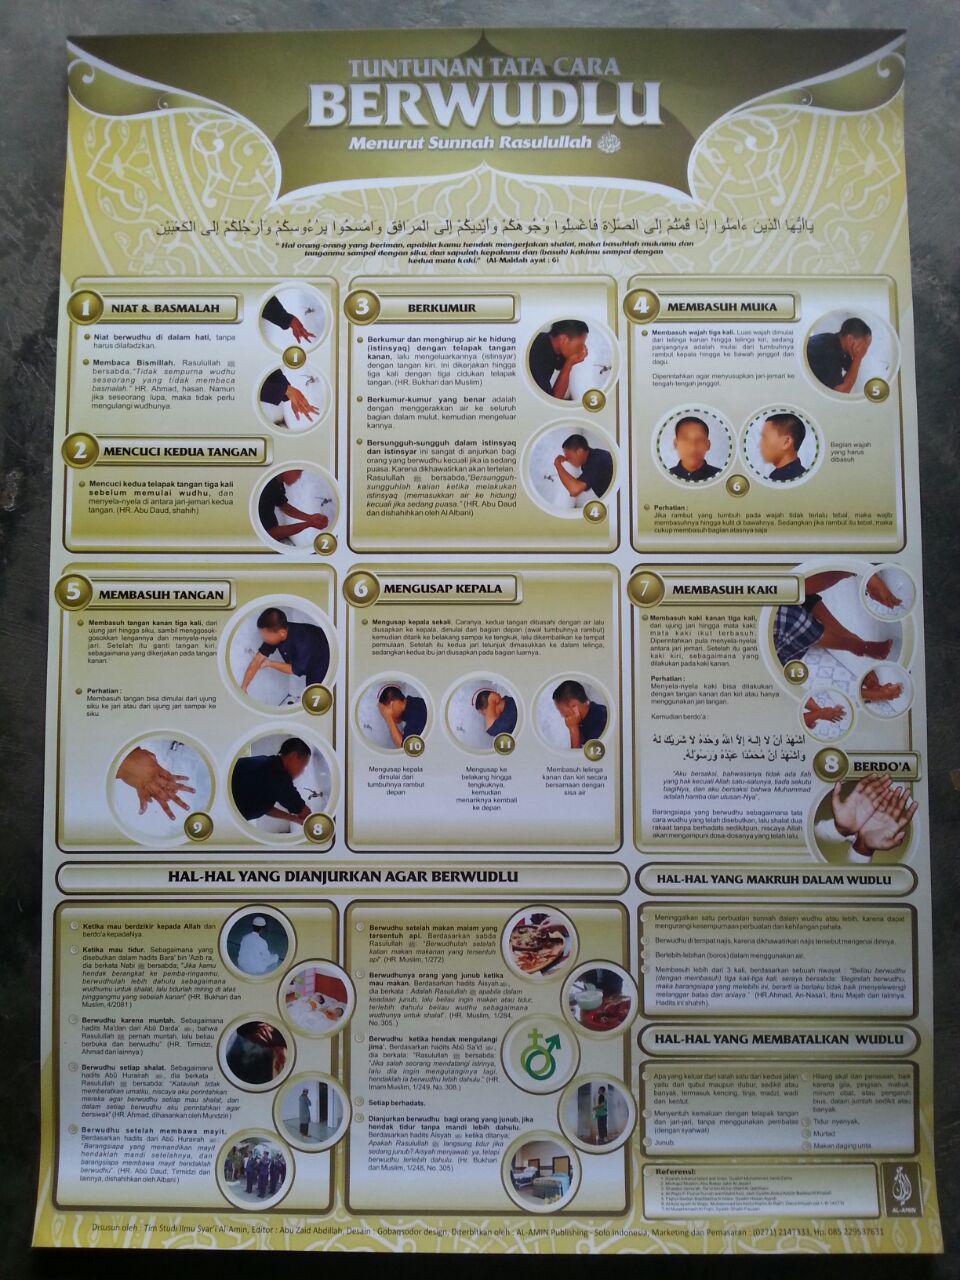 Poster Tuntunan Tata Cara Berwudhu